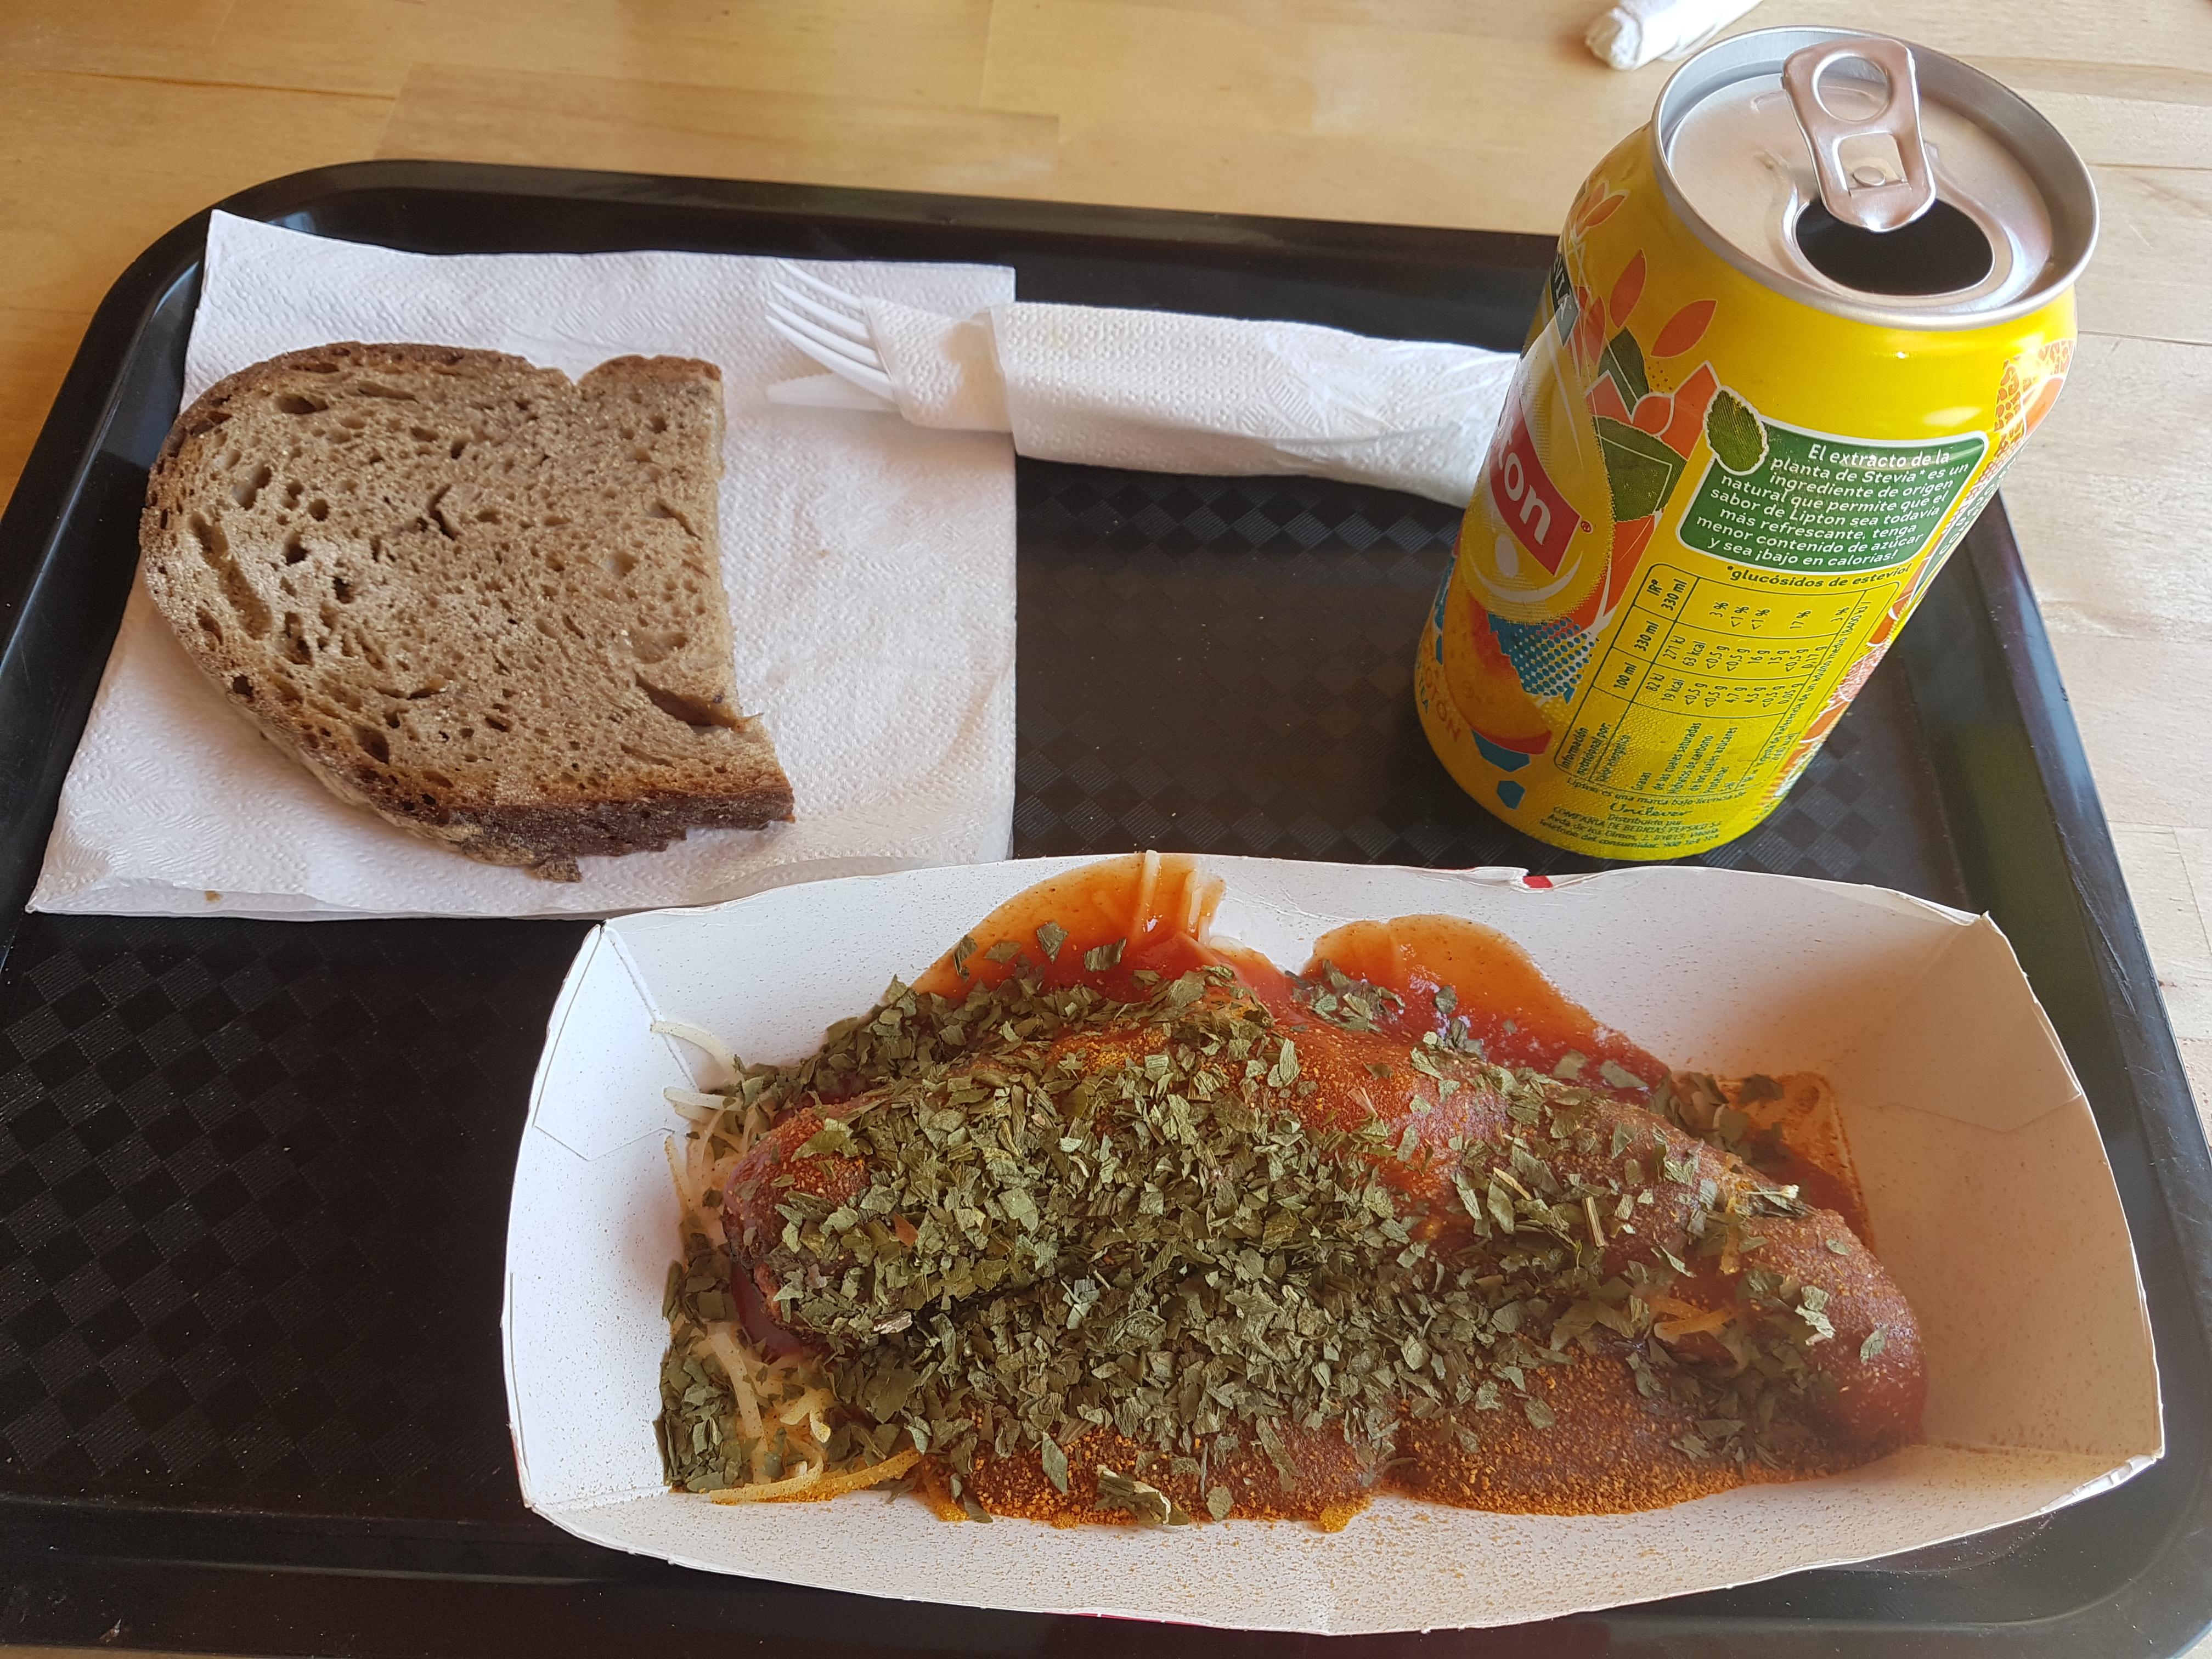 http://foodloader.net/Holz_2017-06-18_DJ_Duese_Wurst.jpg